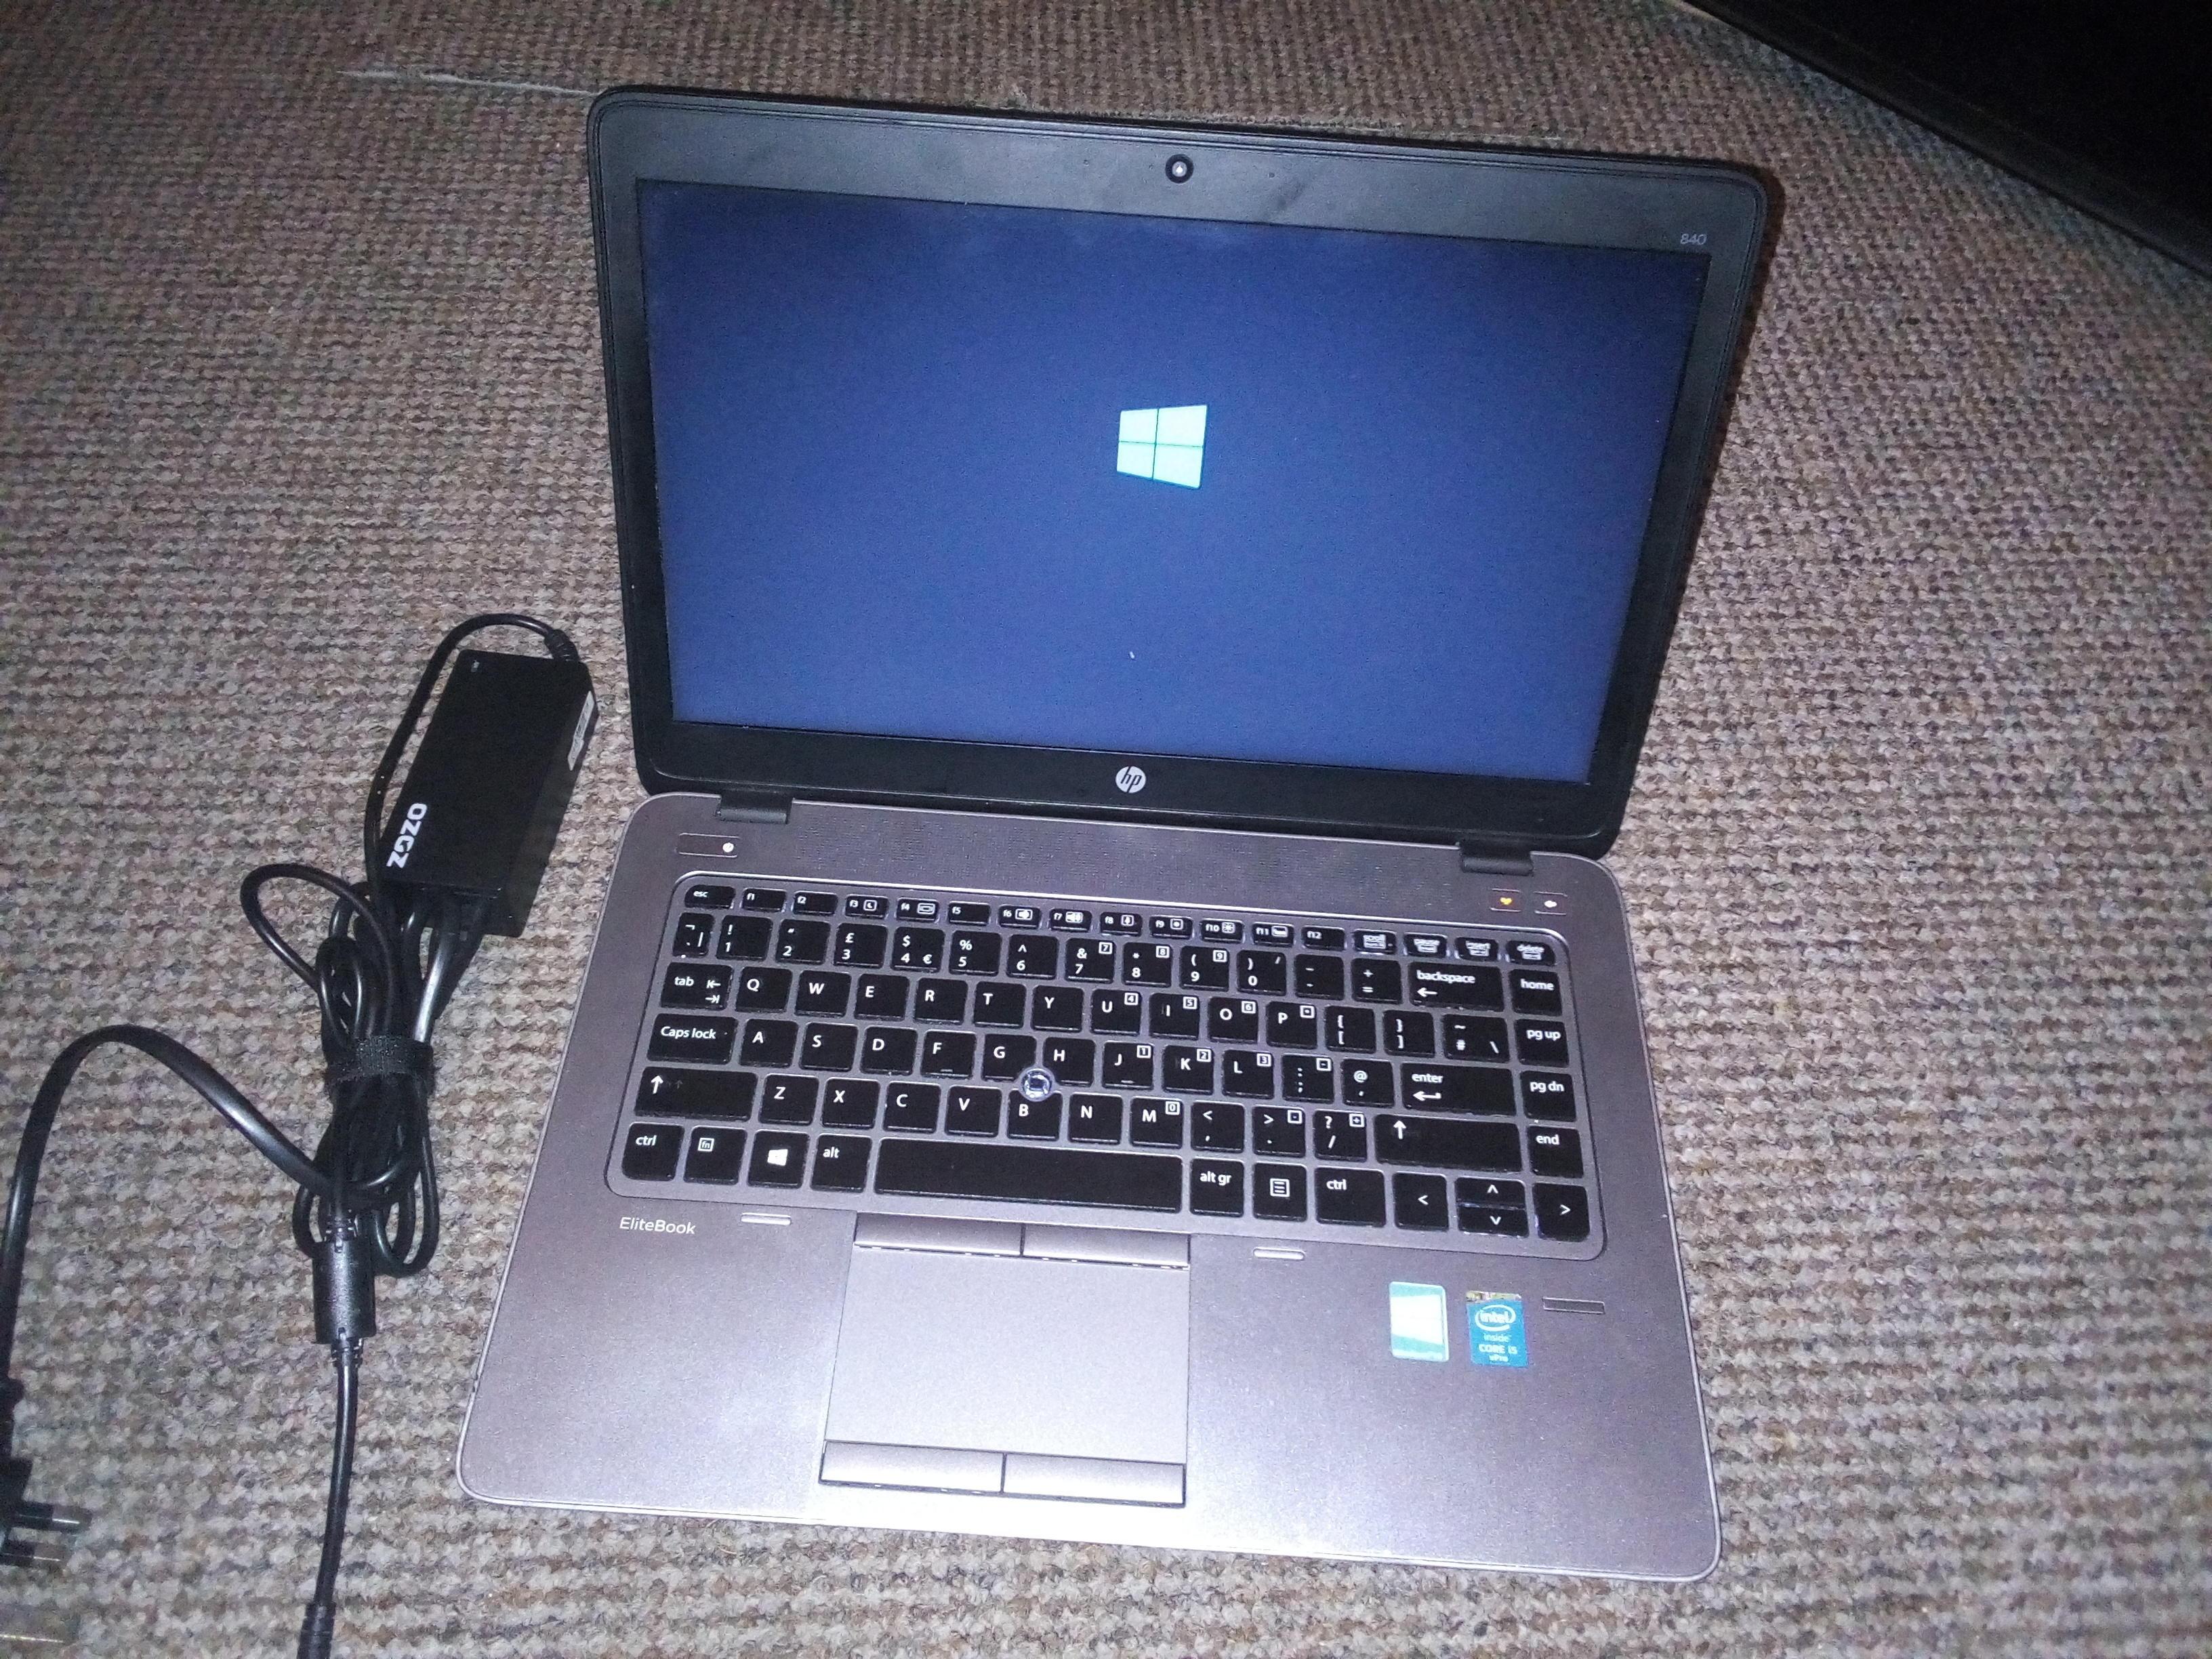 HP Elitebook 840 G2 Intel Core i5 Laptop